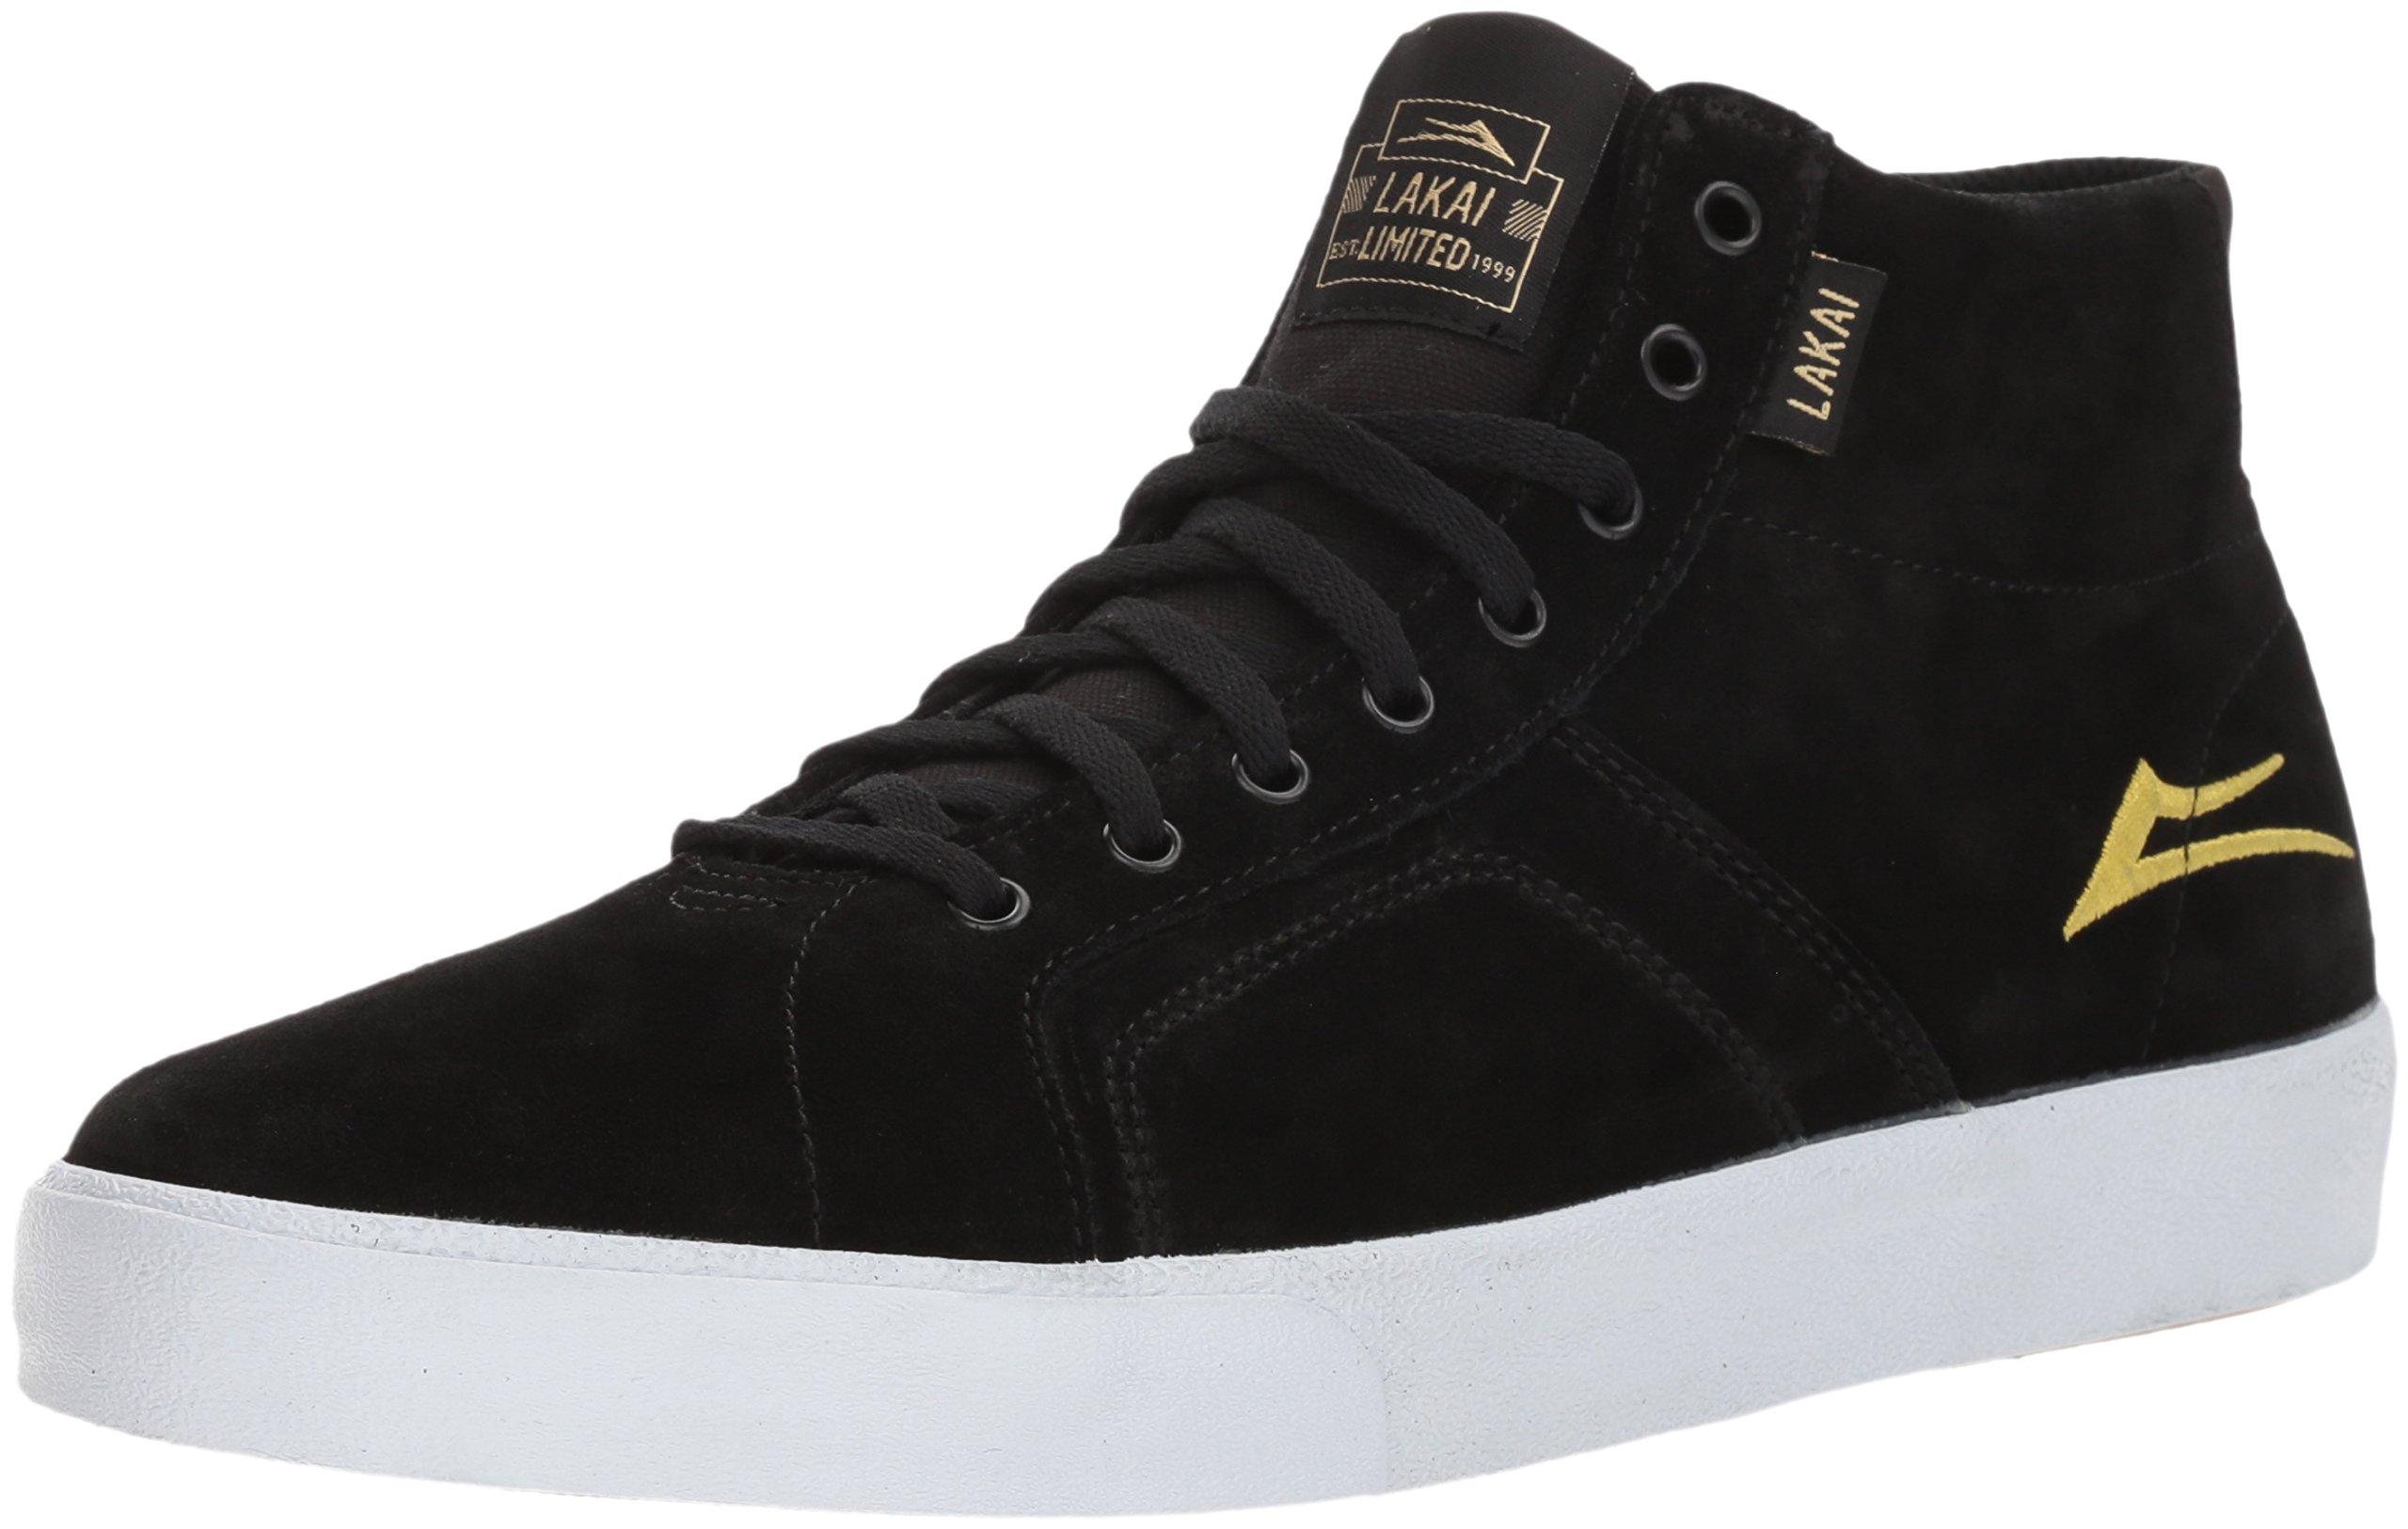 Lakai Flaco HIGH Skate Shoe- Buy Online